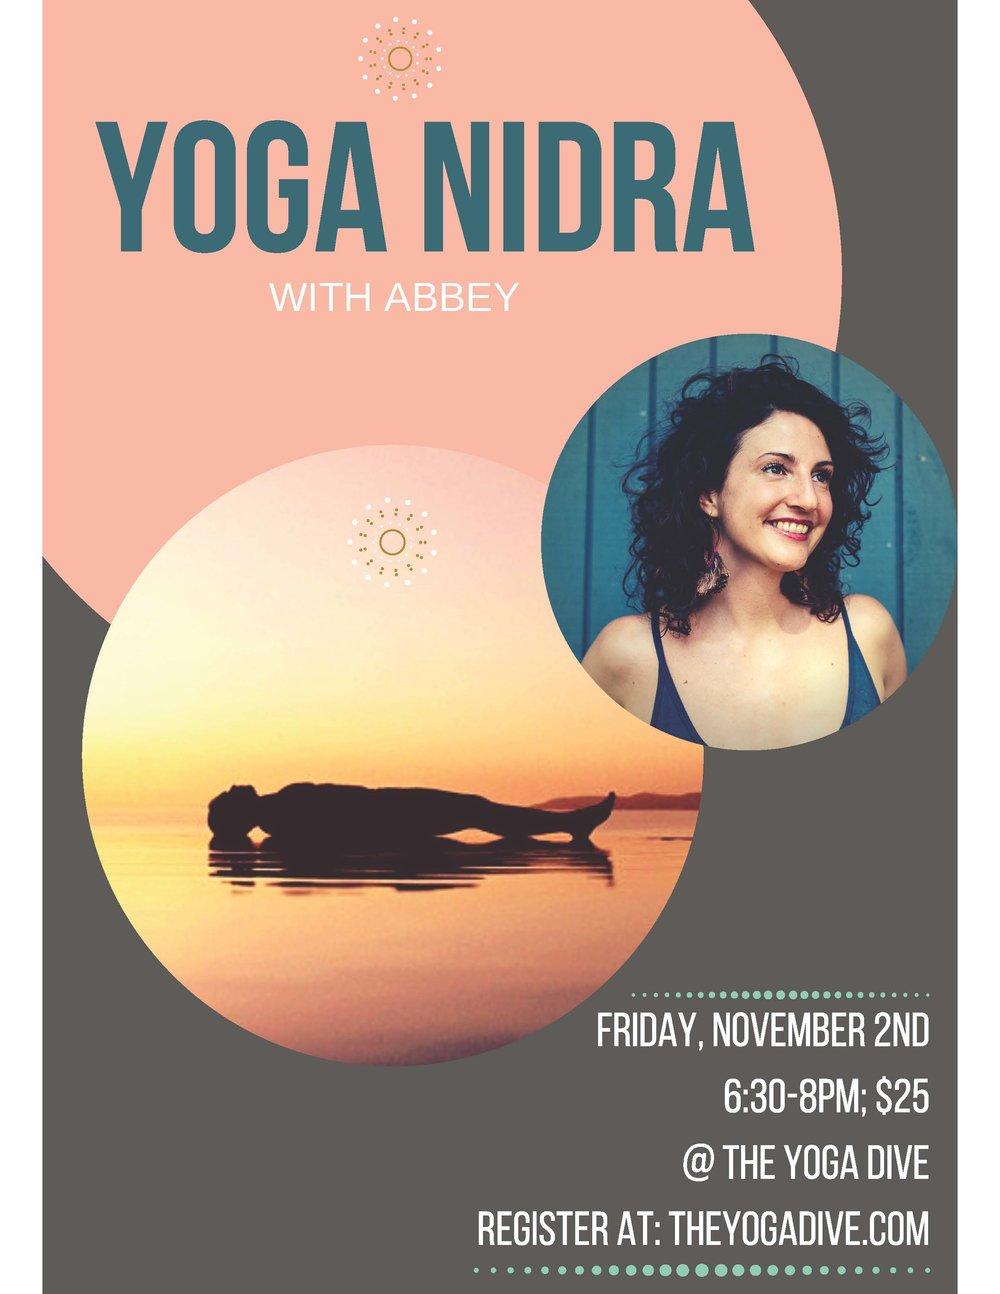 Yoga Nidra Workshop at The Yoga Dive